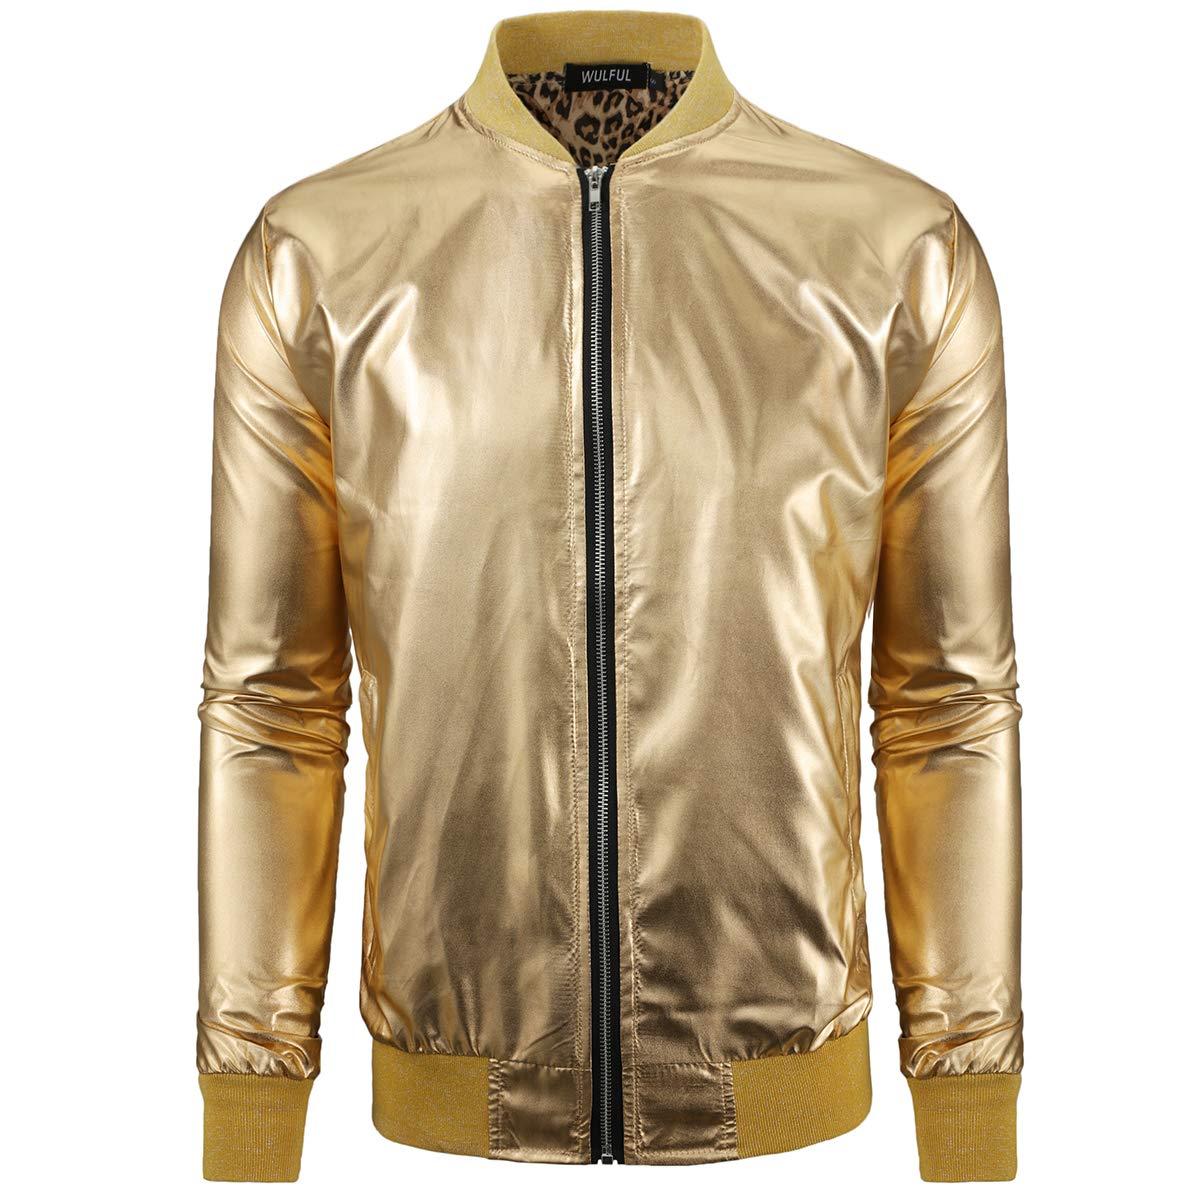 WULFUL Men Metallic Party Nightclub Jackets Gold Halloween Zip Up Baseball Bomber Jacket by WULFUL